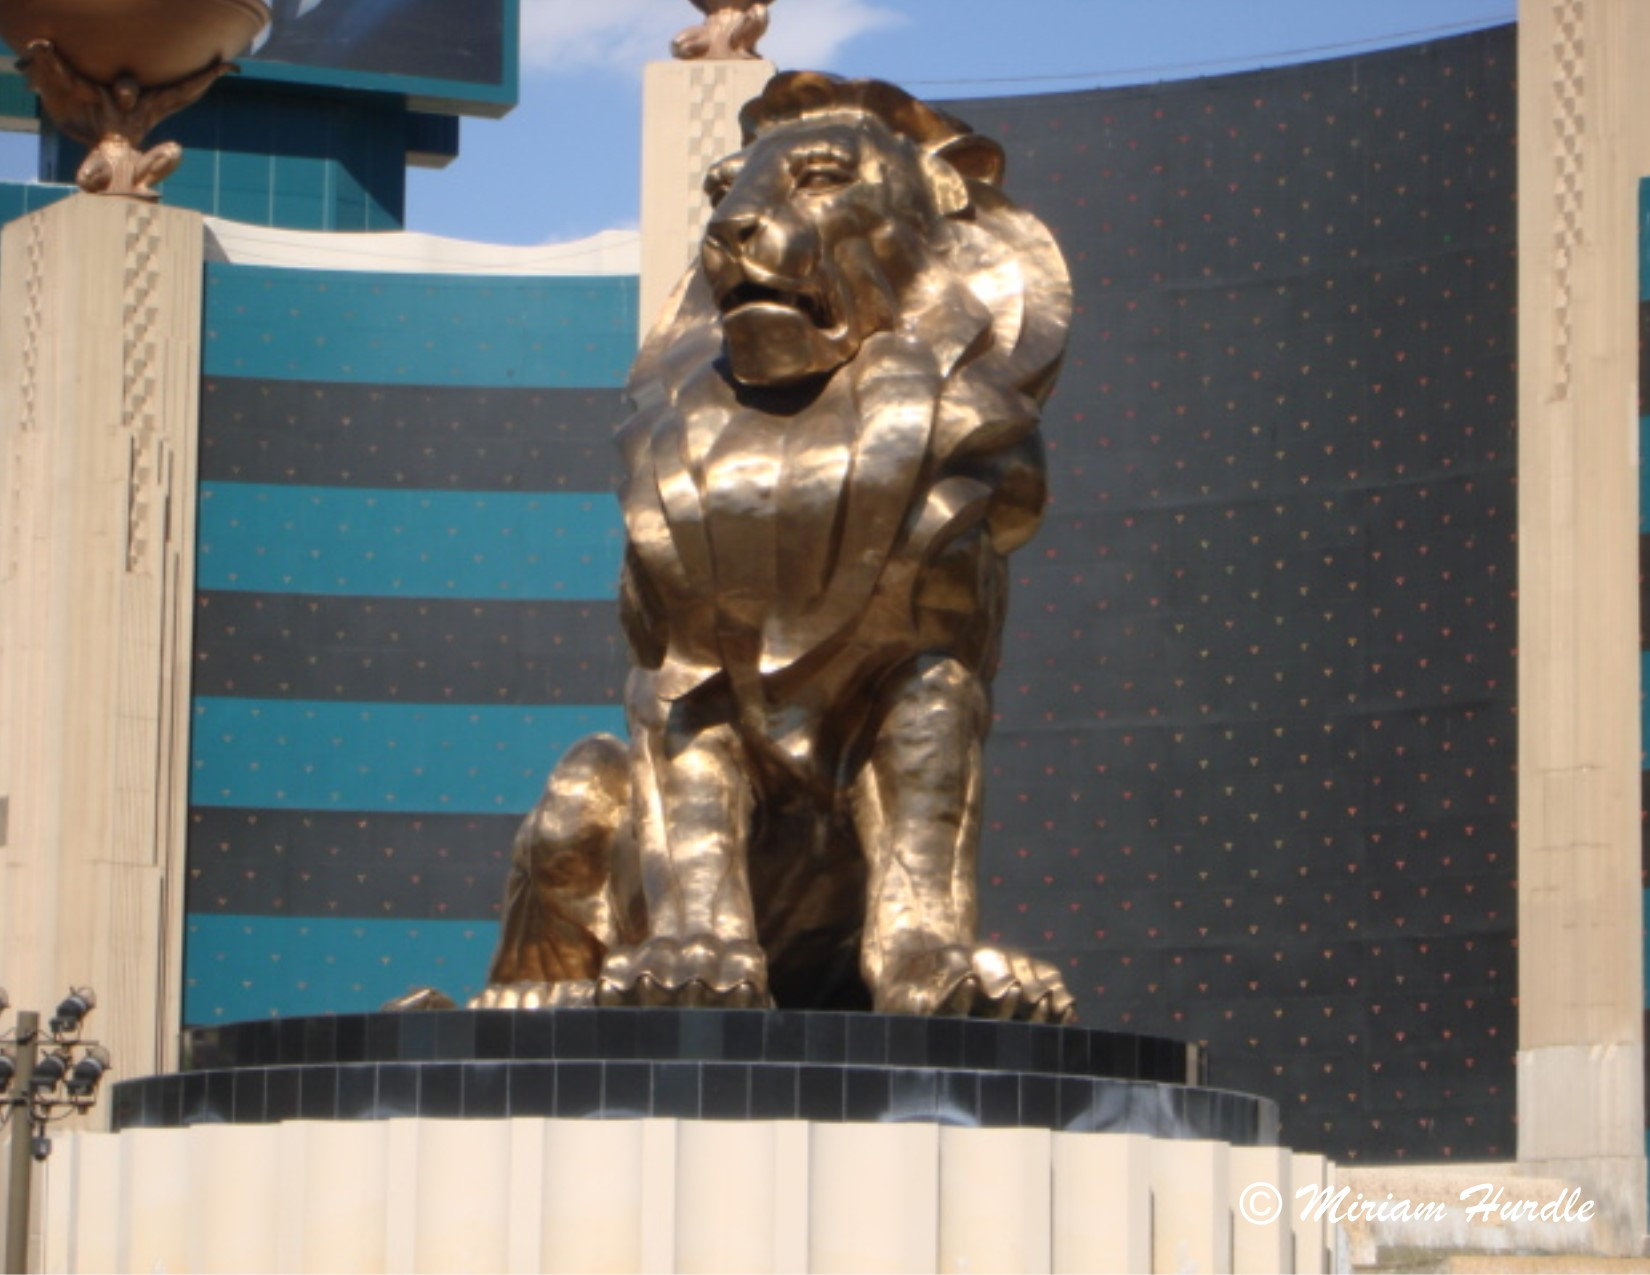 1.Las Vegas lion